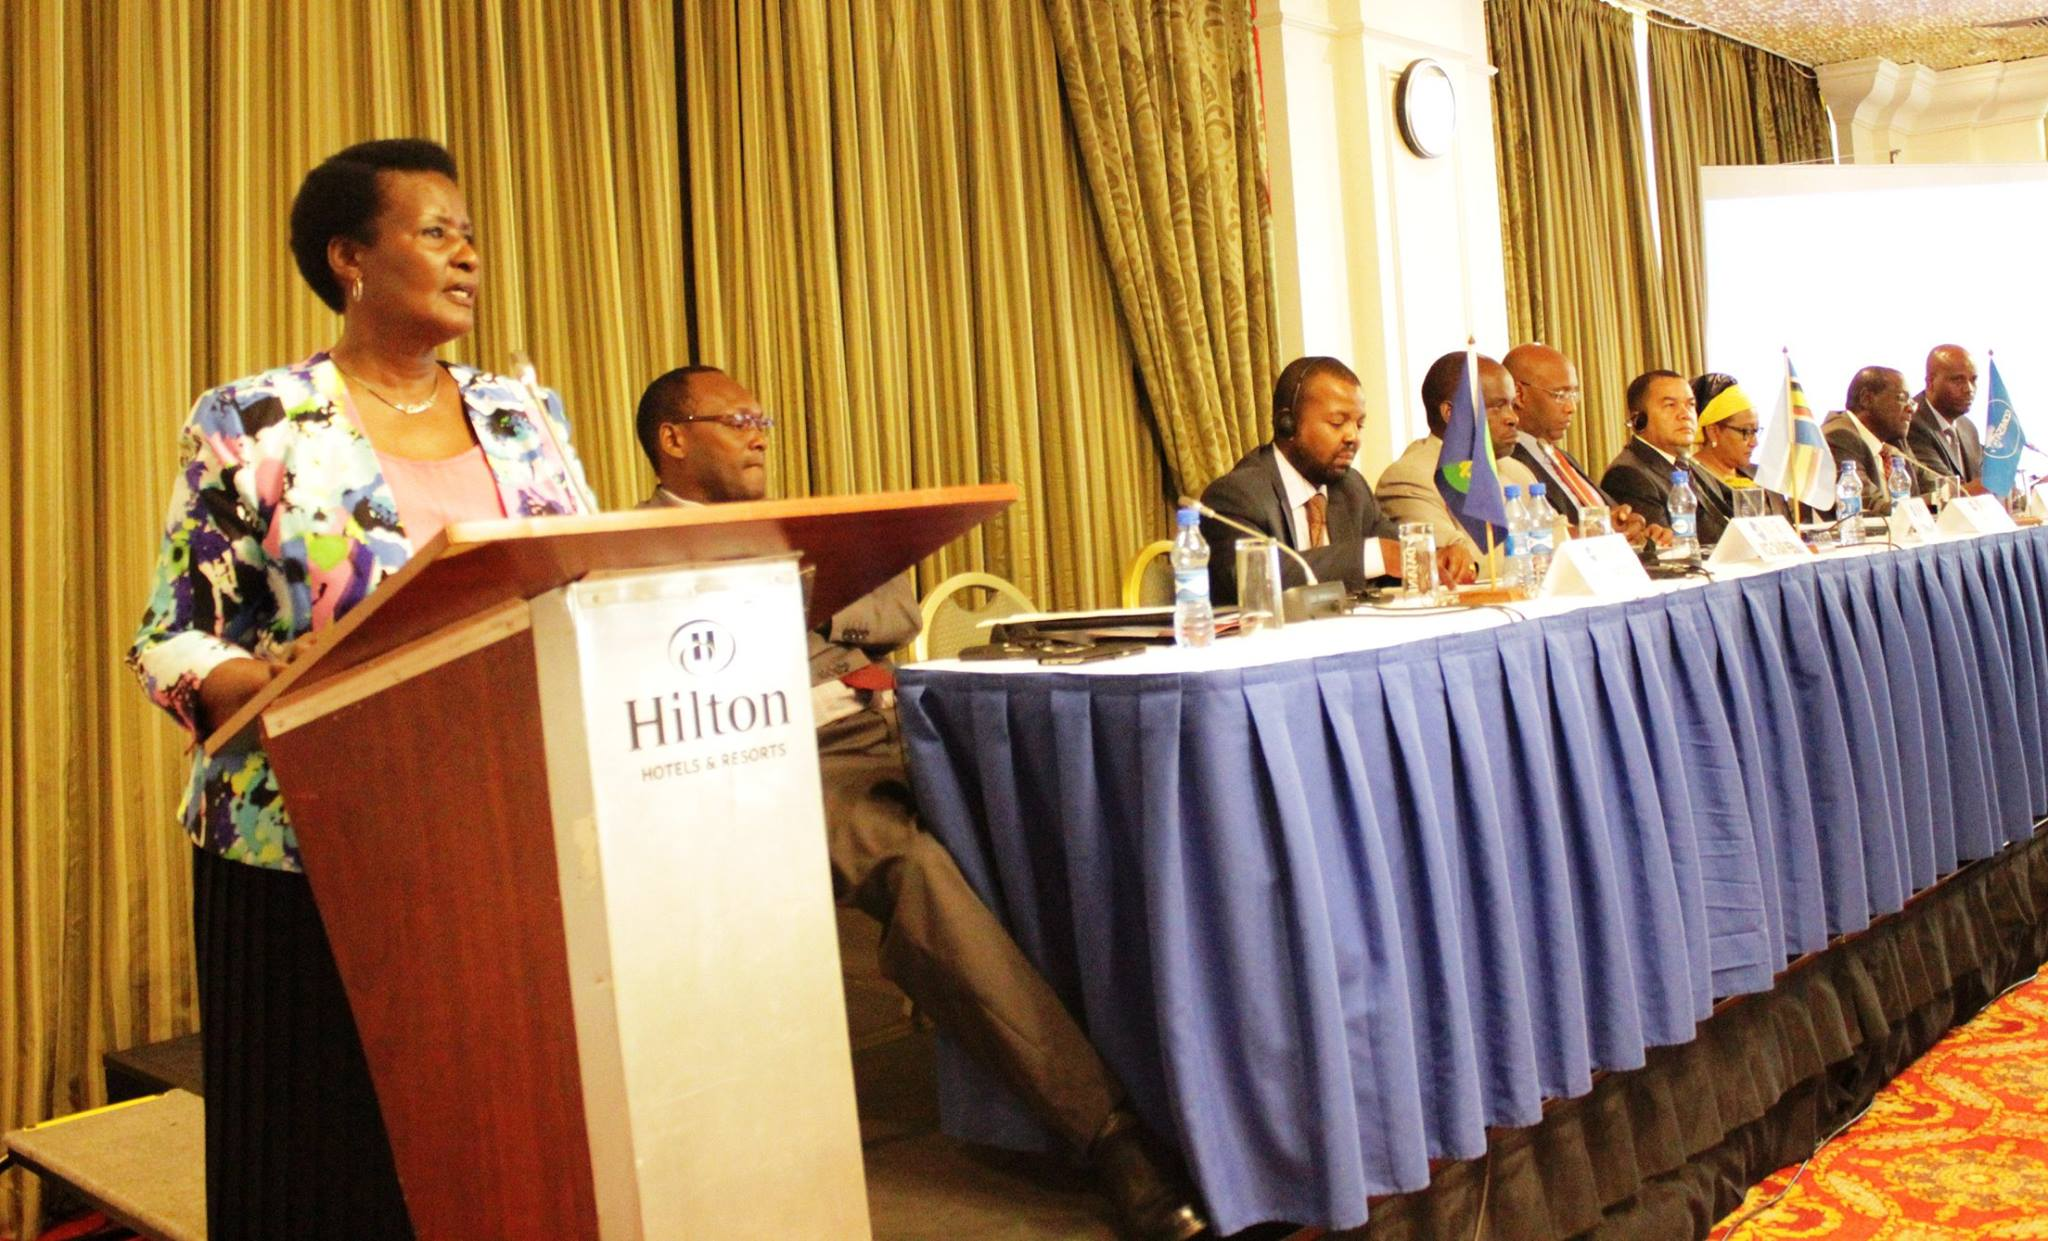 Minister Kyambadde addressing the meeting in Nairobi on Sunday.